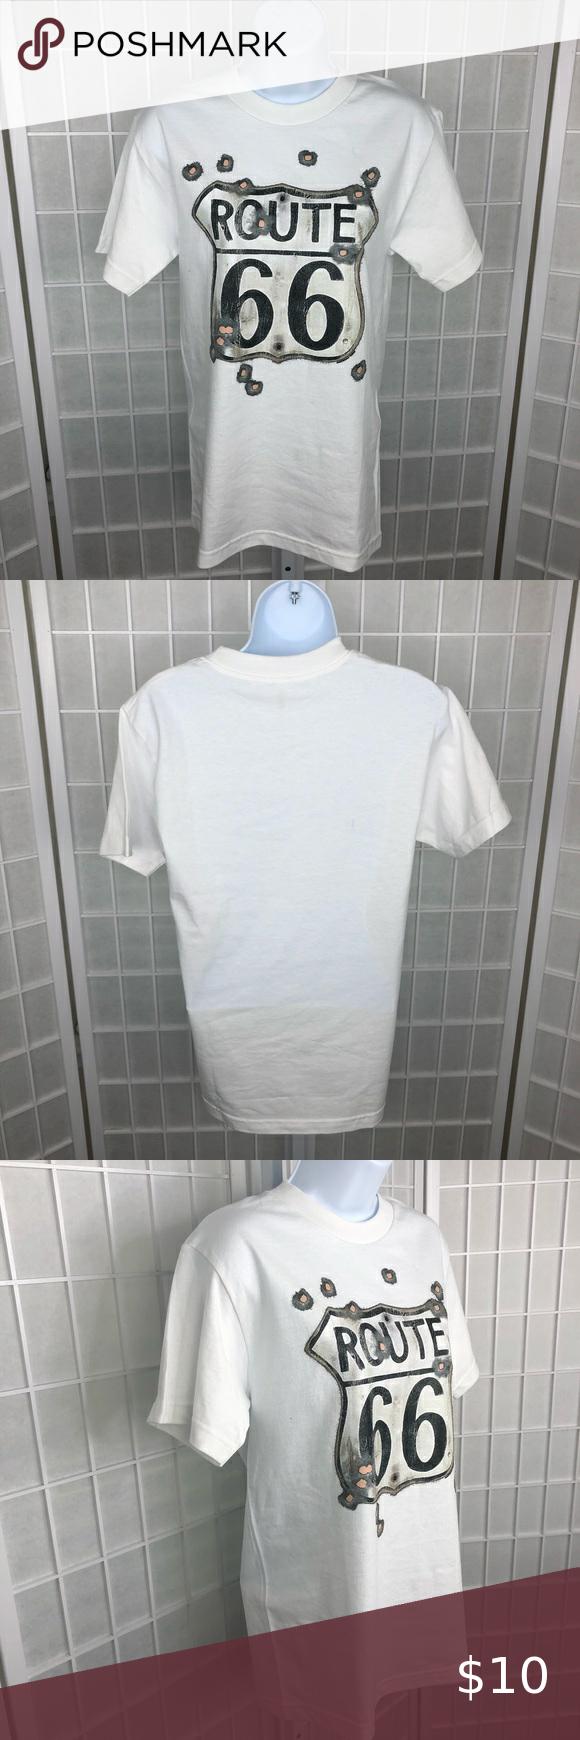 Alstyle Apparel Activewear Women S Tee Shirt Active Wear For Women Alstyle Apparel Tee Shirts